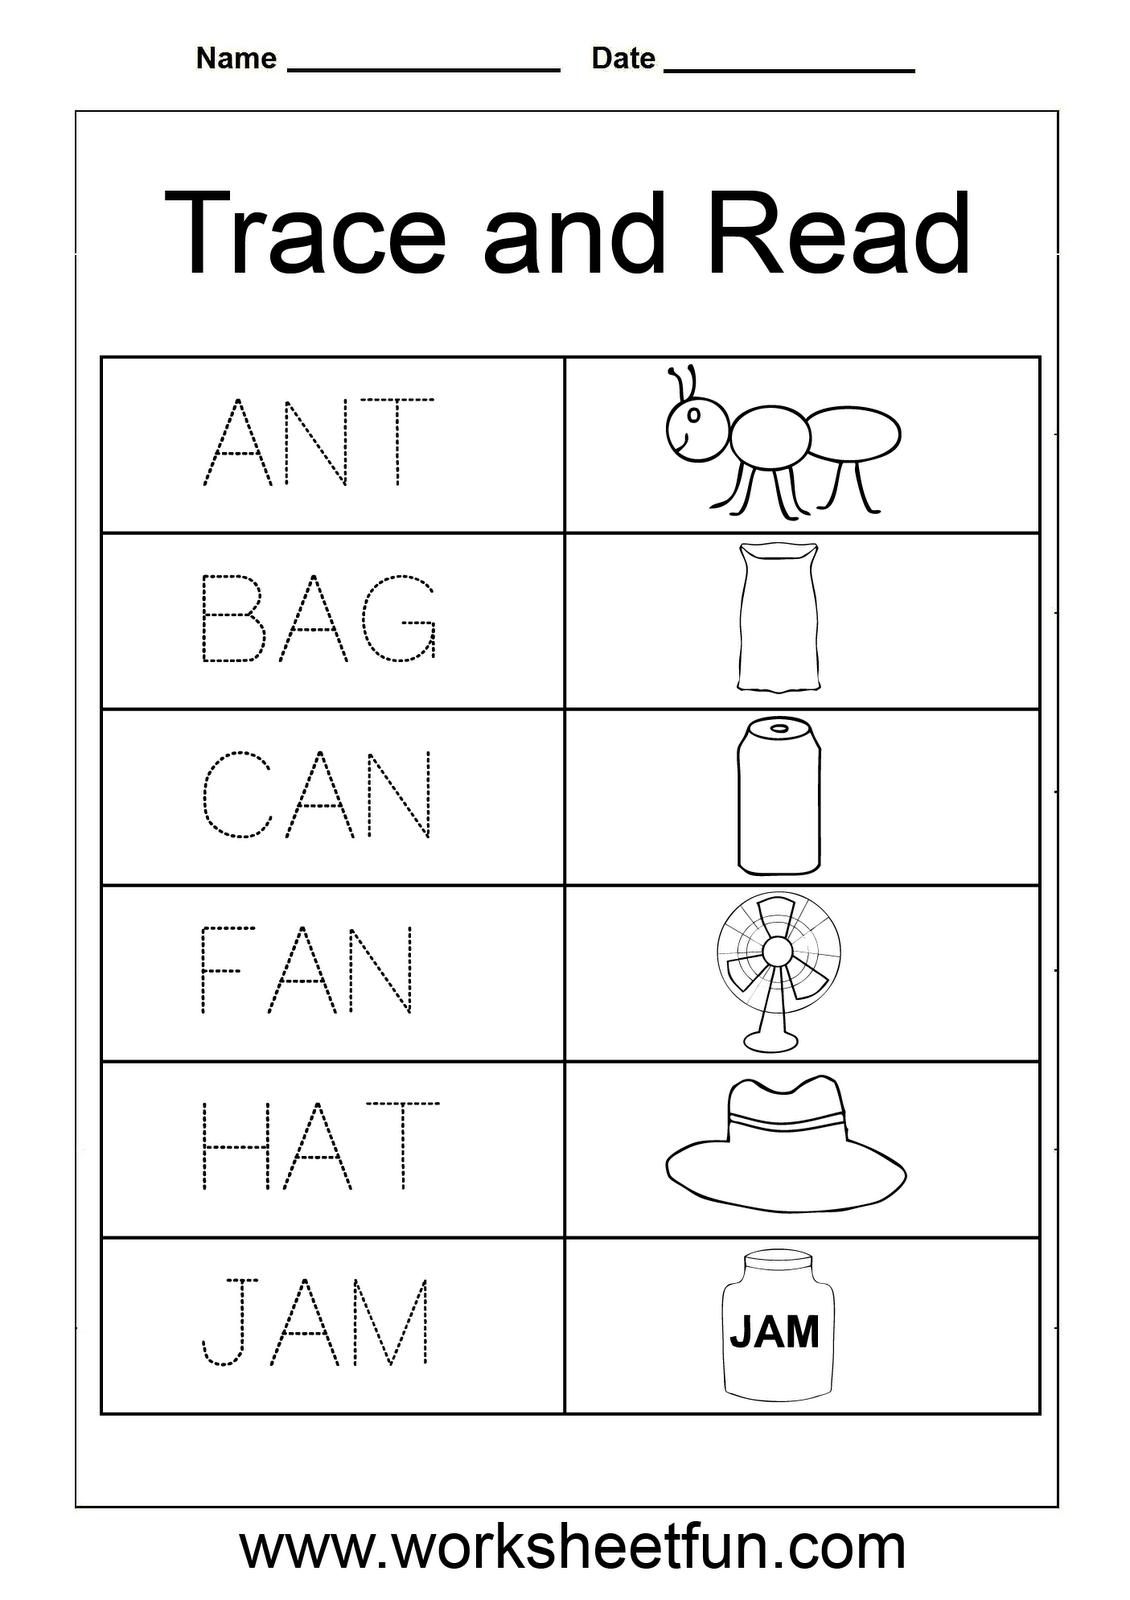 Worksheet On Phonics For Kindergarten